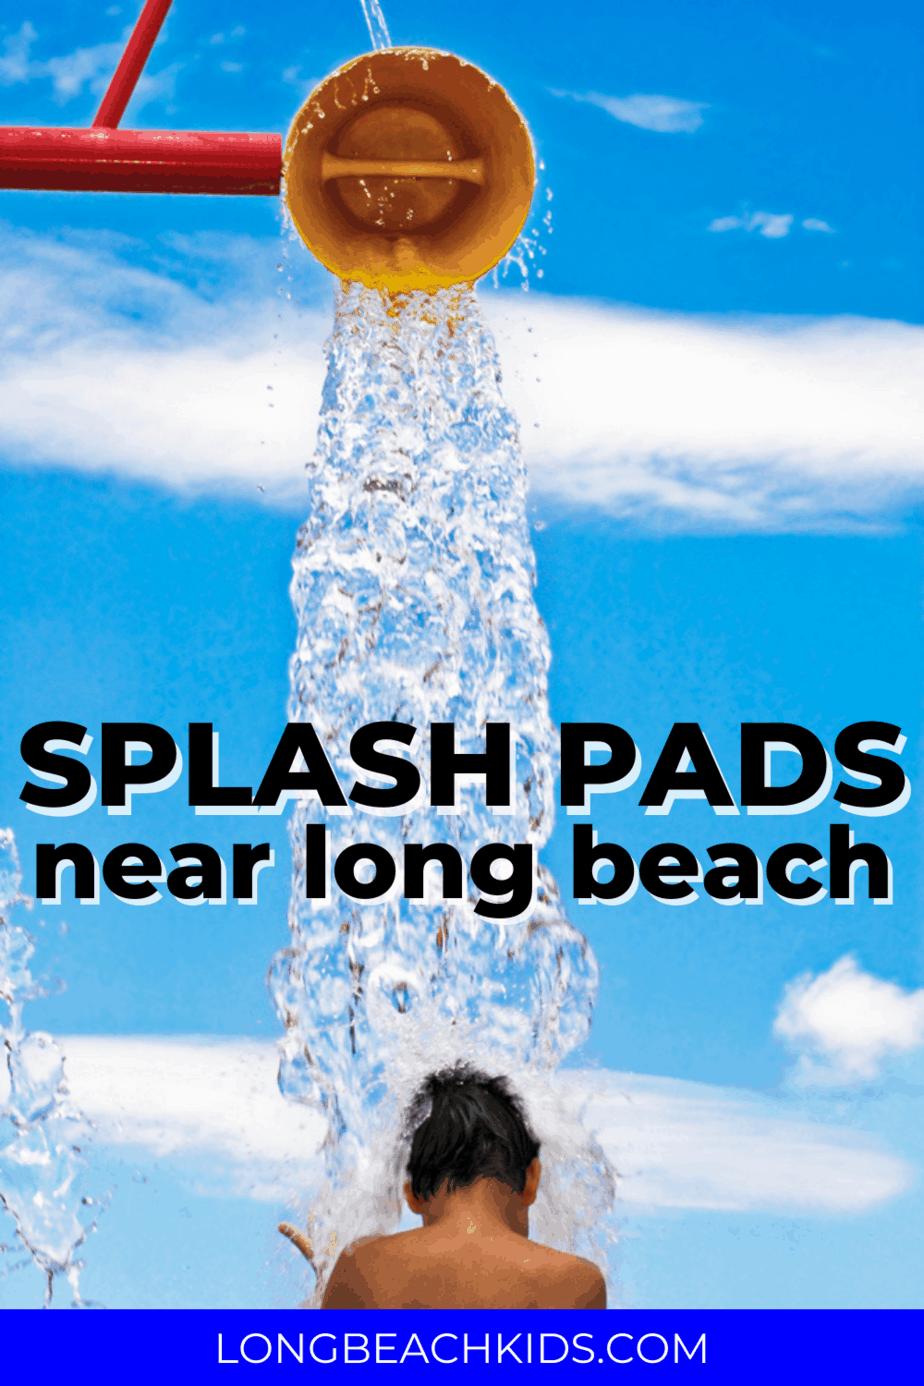 child at splash pad; text: splash pads near long beach